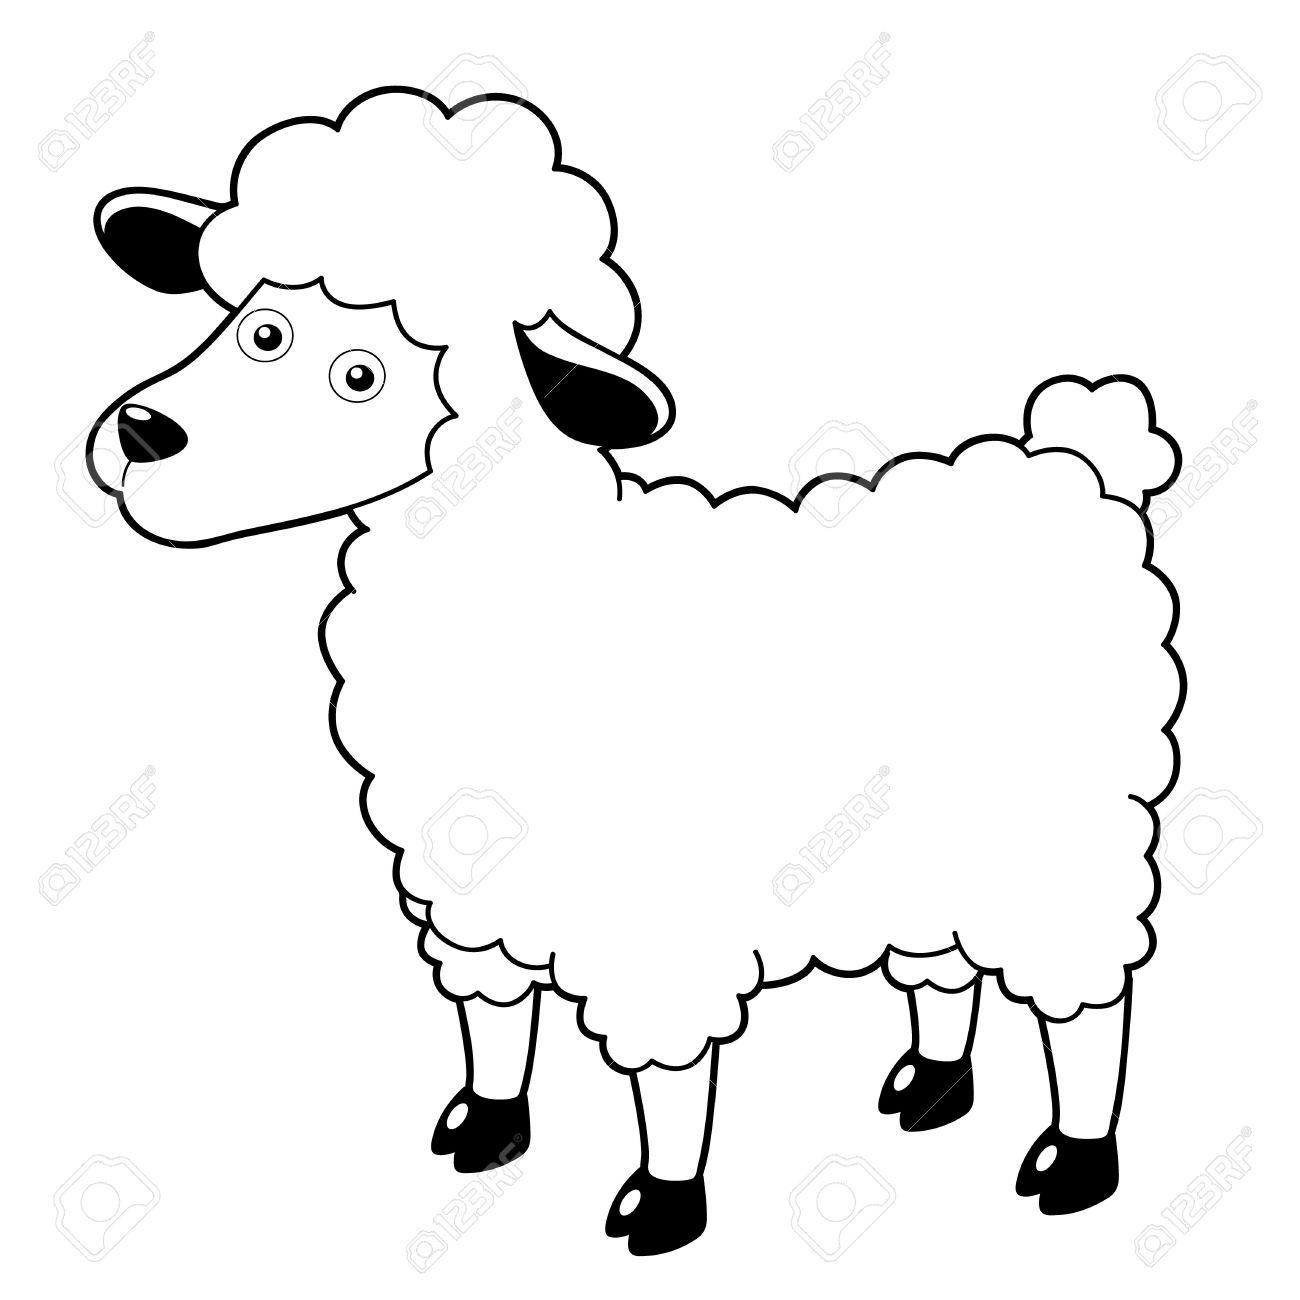 illustration of a cartoon sheep royalty free cliparts vectors and rh 123rf com sheep vector silhouette sheep vector image